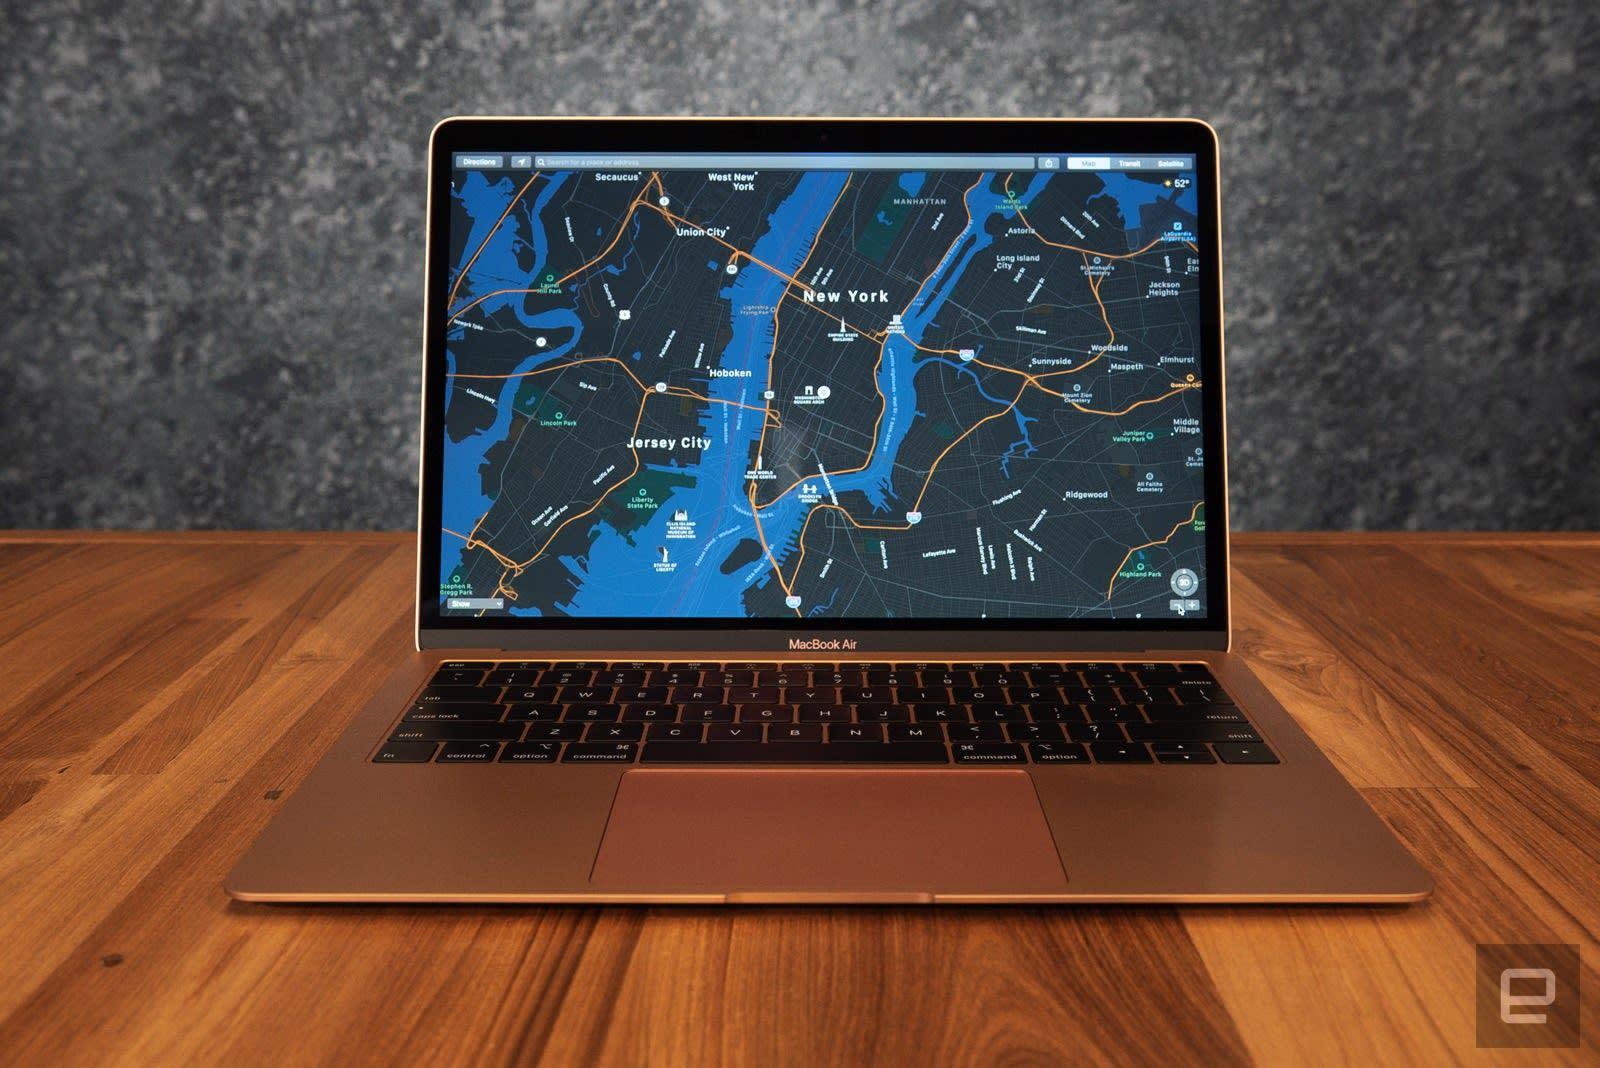 Apple laptop MacBook Air 2018 in Kenya 13-inch Retina display, 1.6GHz dual-core Intel Core i5, 128GB